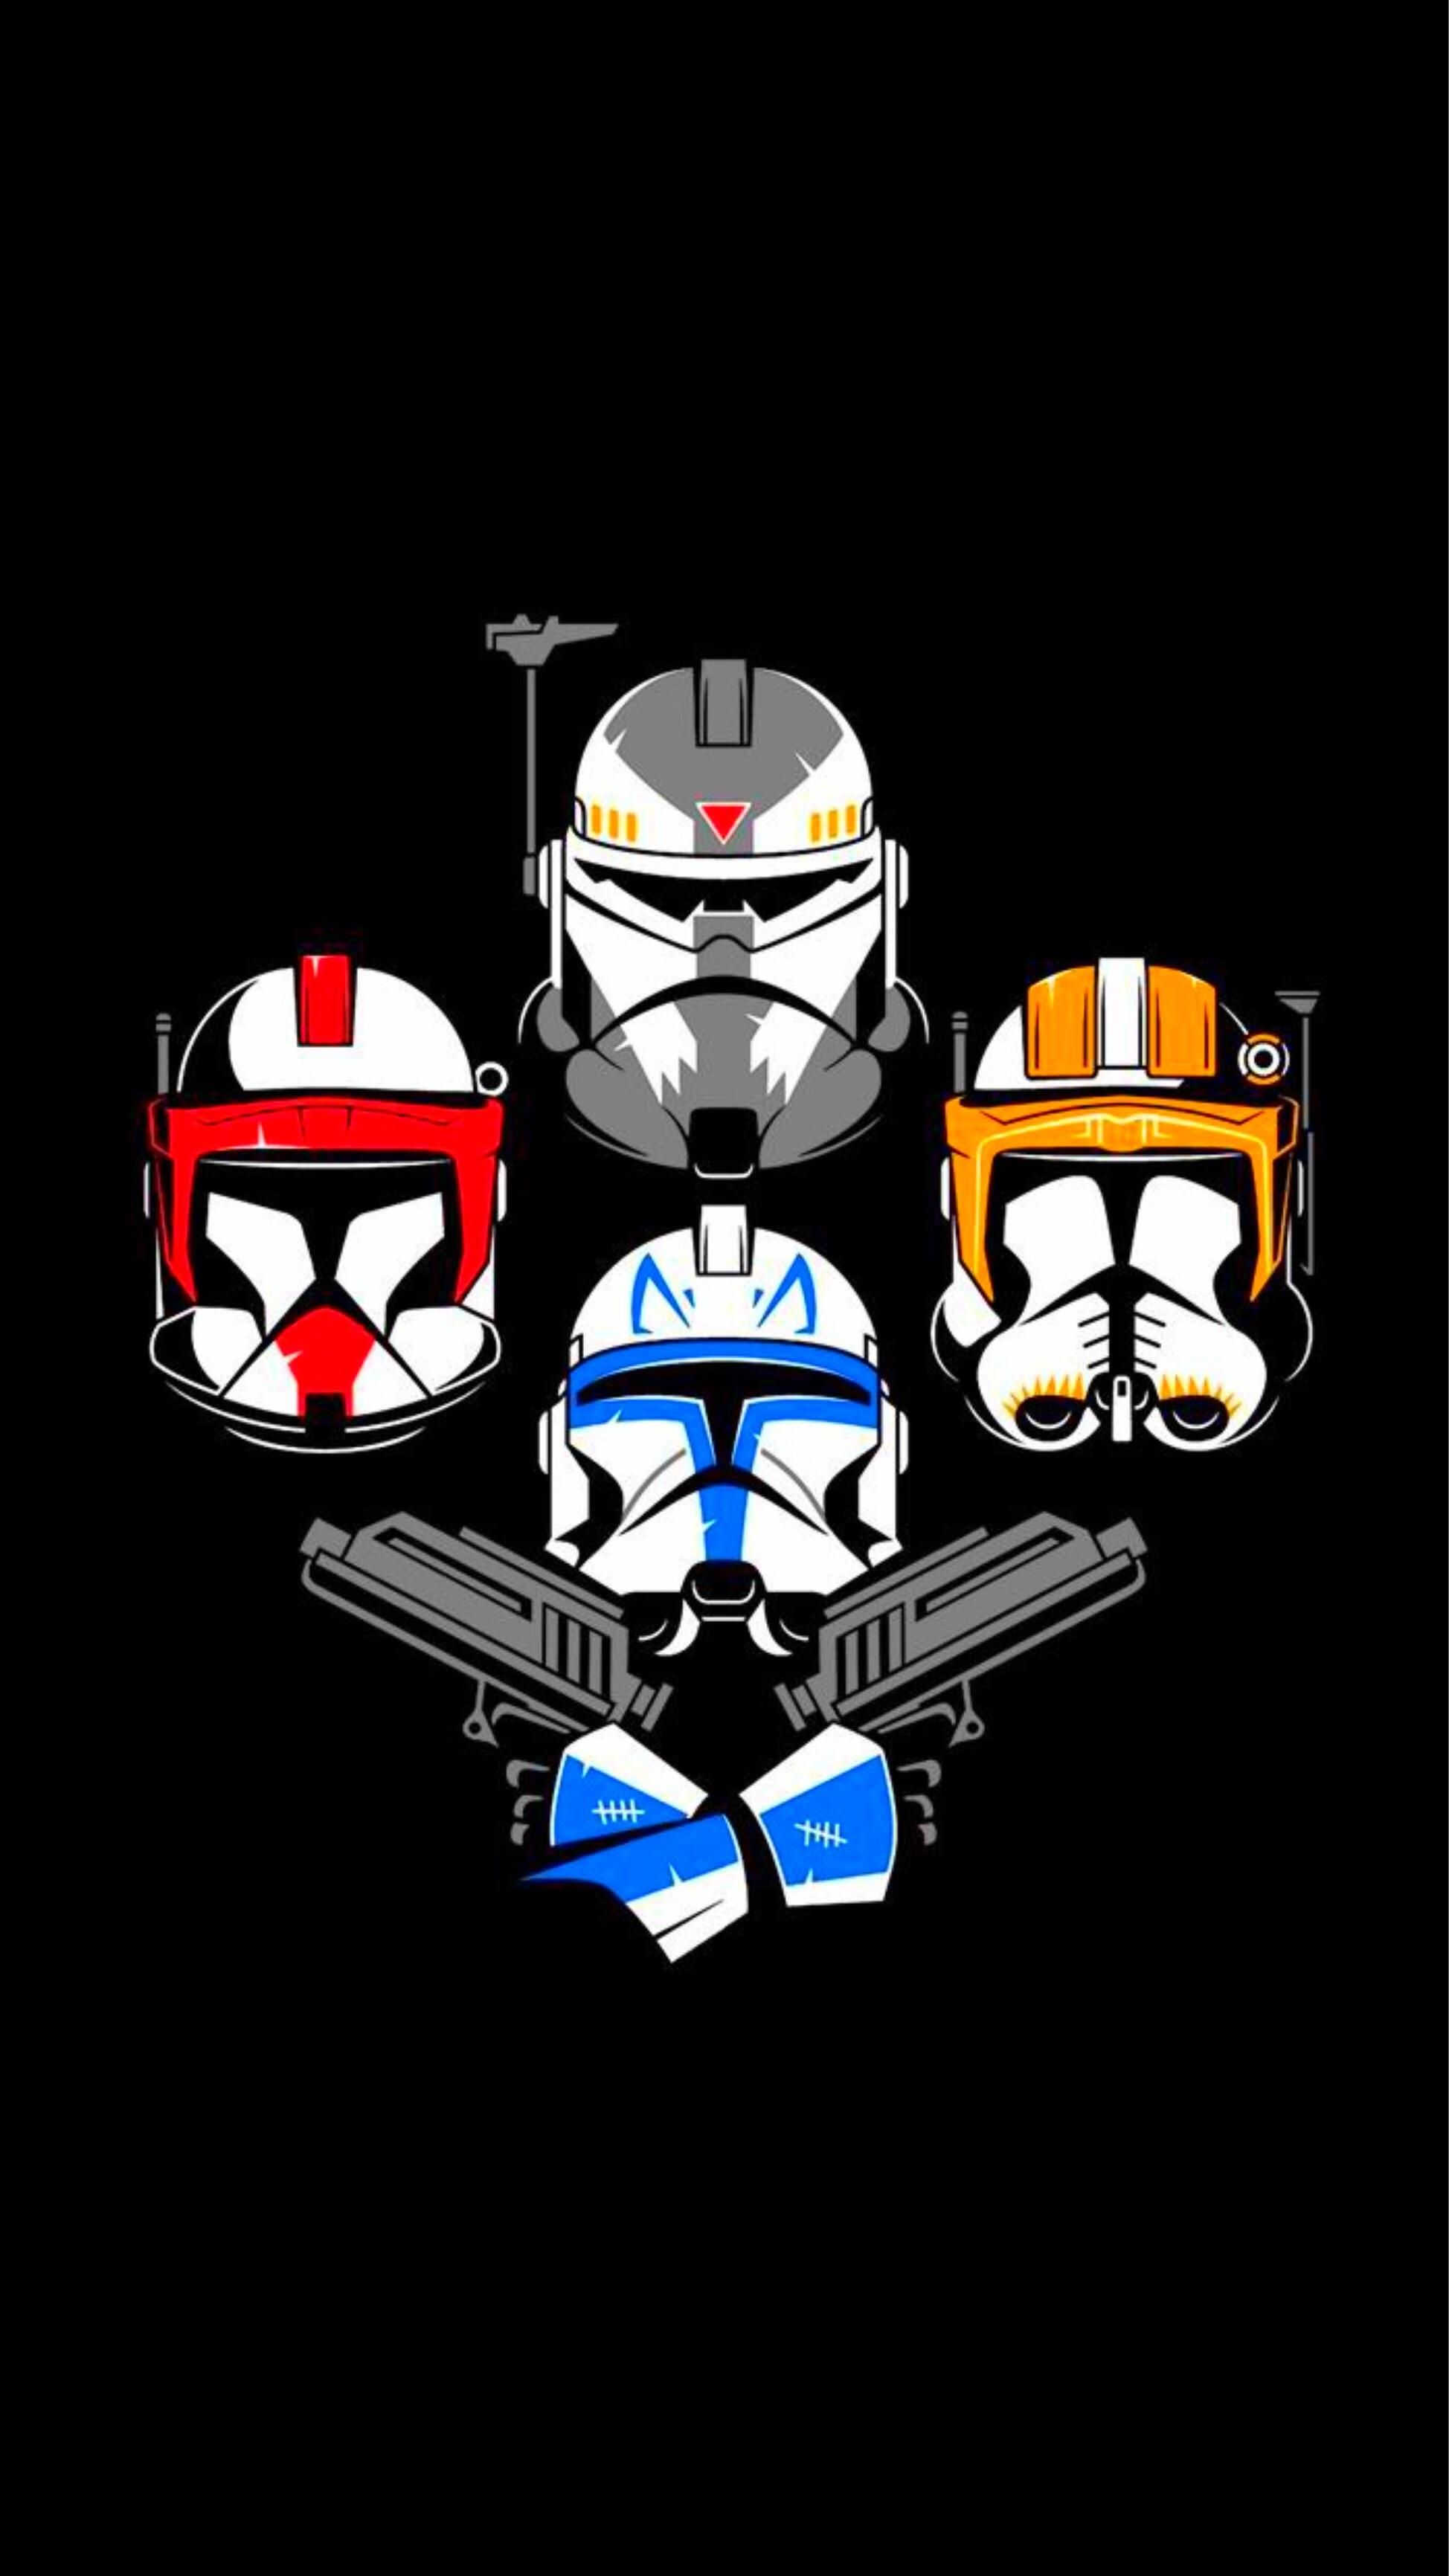 Have A Nice Wallpaper Http Bit Ly 2ebuma4 Star Wars Artwork Star Wars Background Star Wars Poster